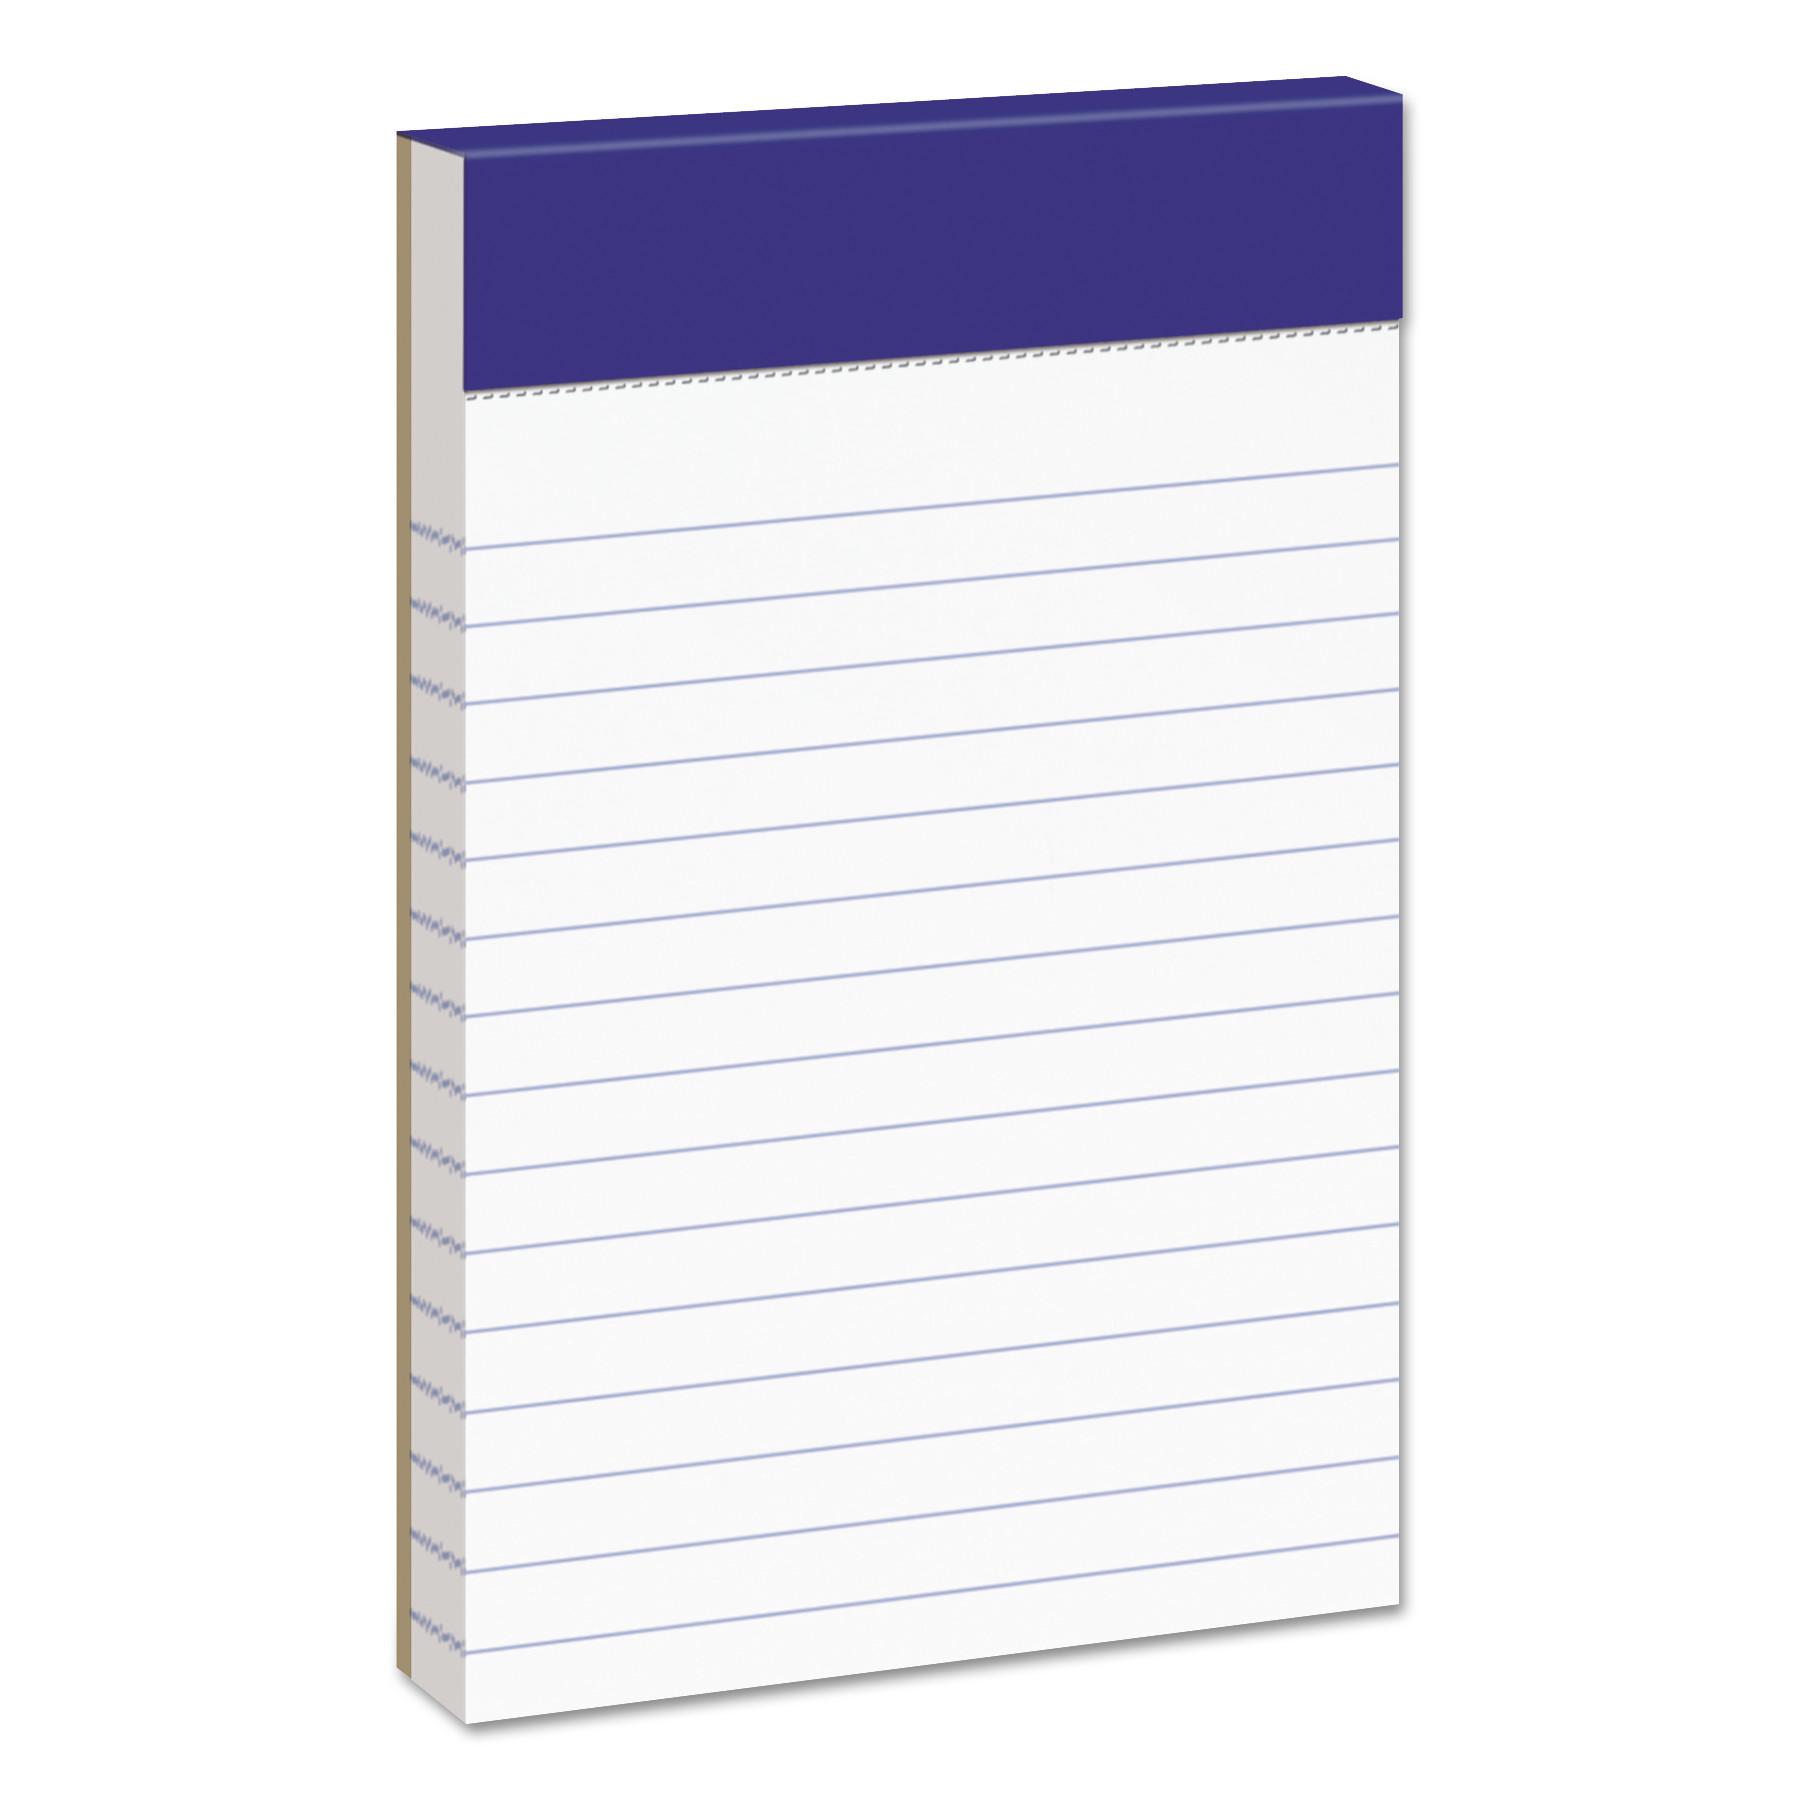 White 50 Sheets 2 Dozens Narrow Perforated Writing Pad 5 x 8